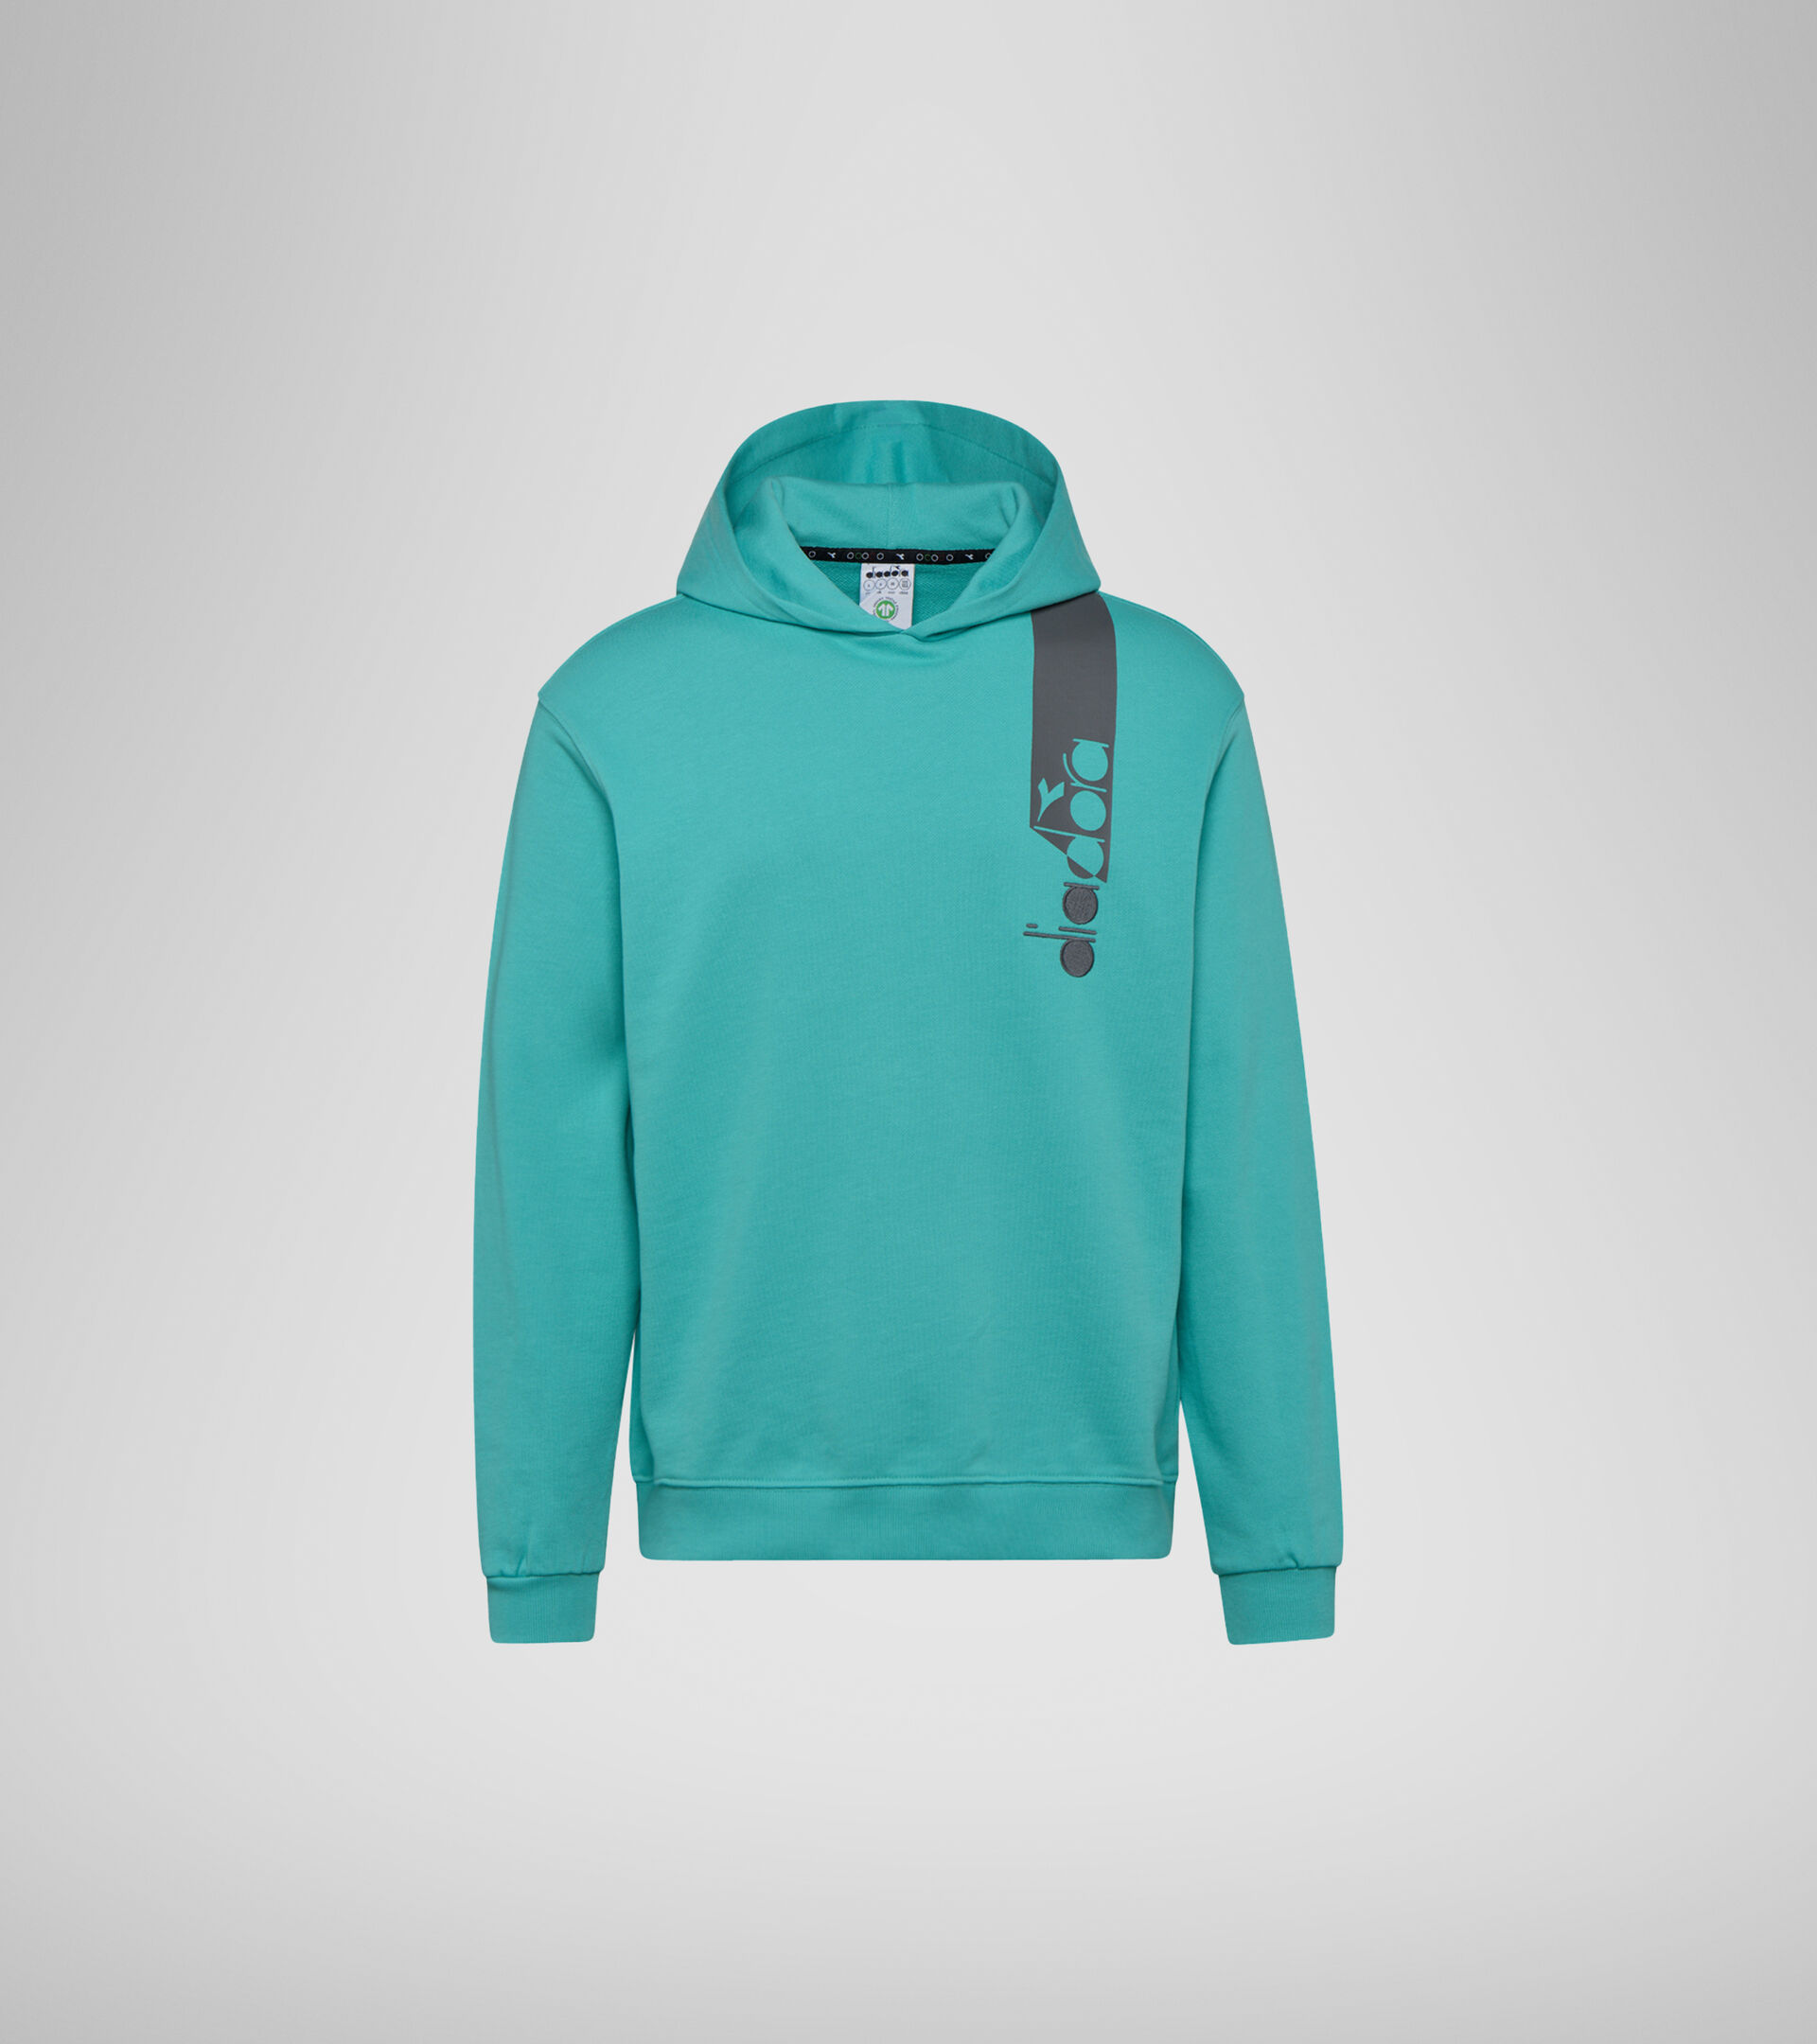 Hooded sweatshirt - Unisex HOODIE ICON GREEN FLORIDA KEYS - Diadora